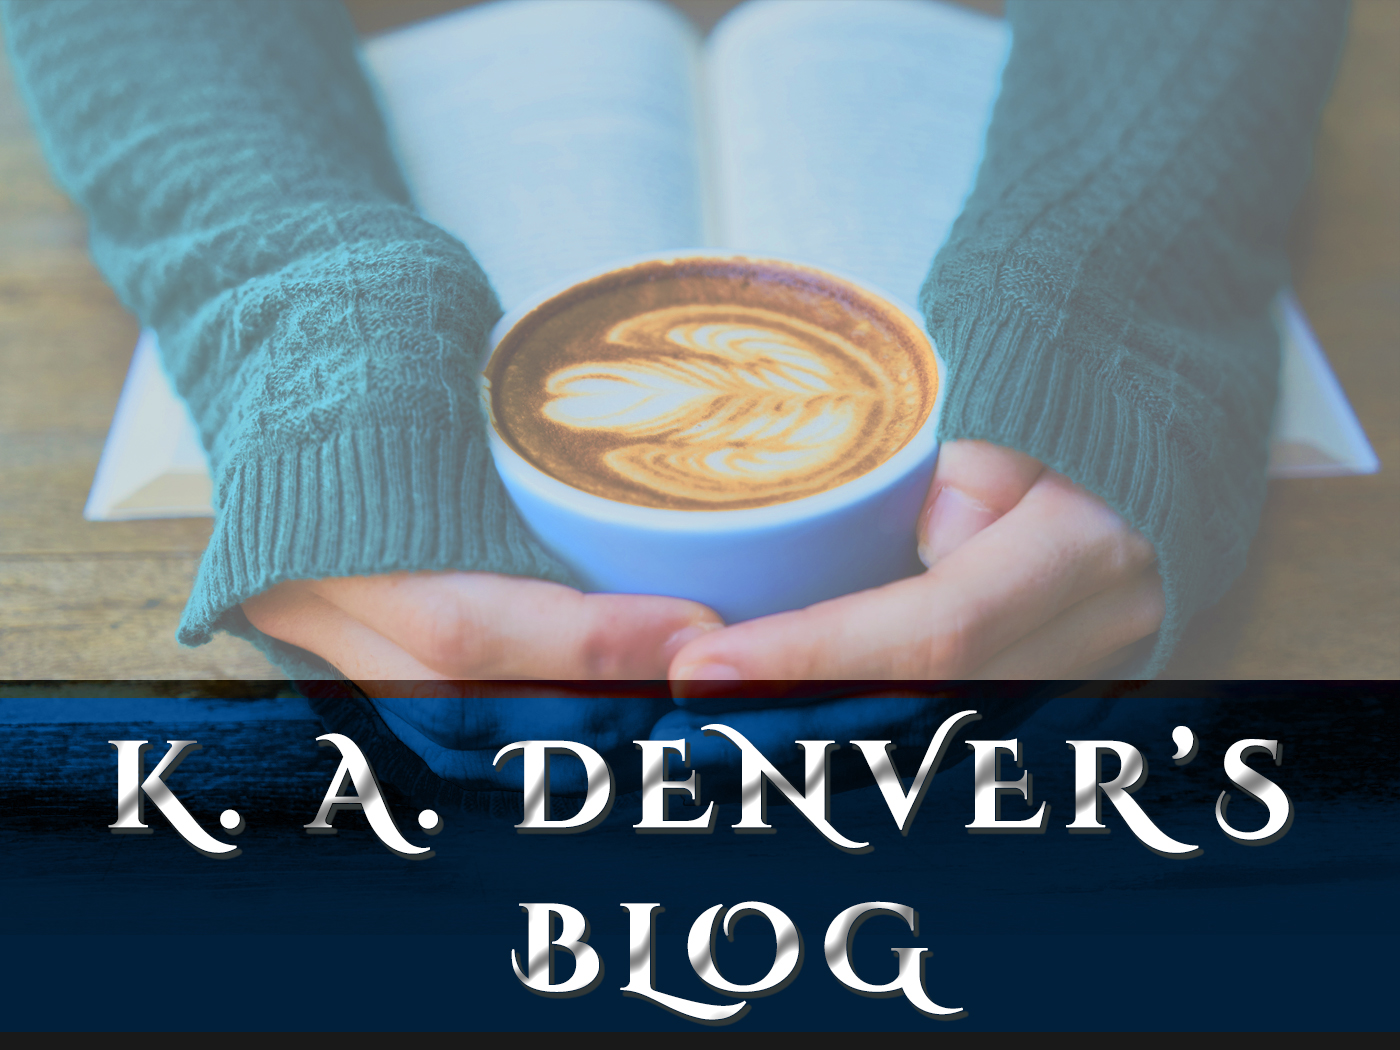 K.A. Denver's Facebook